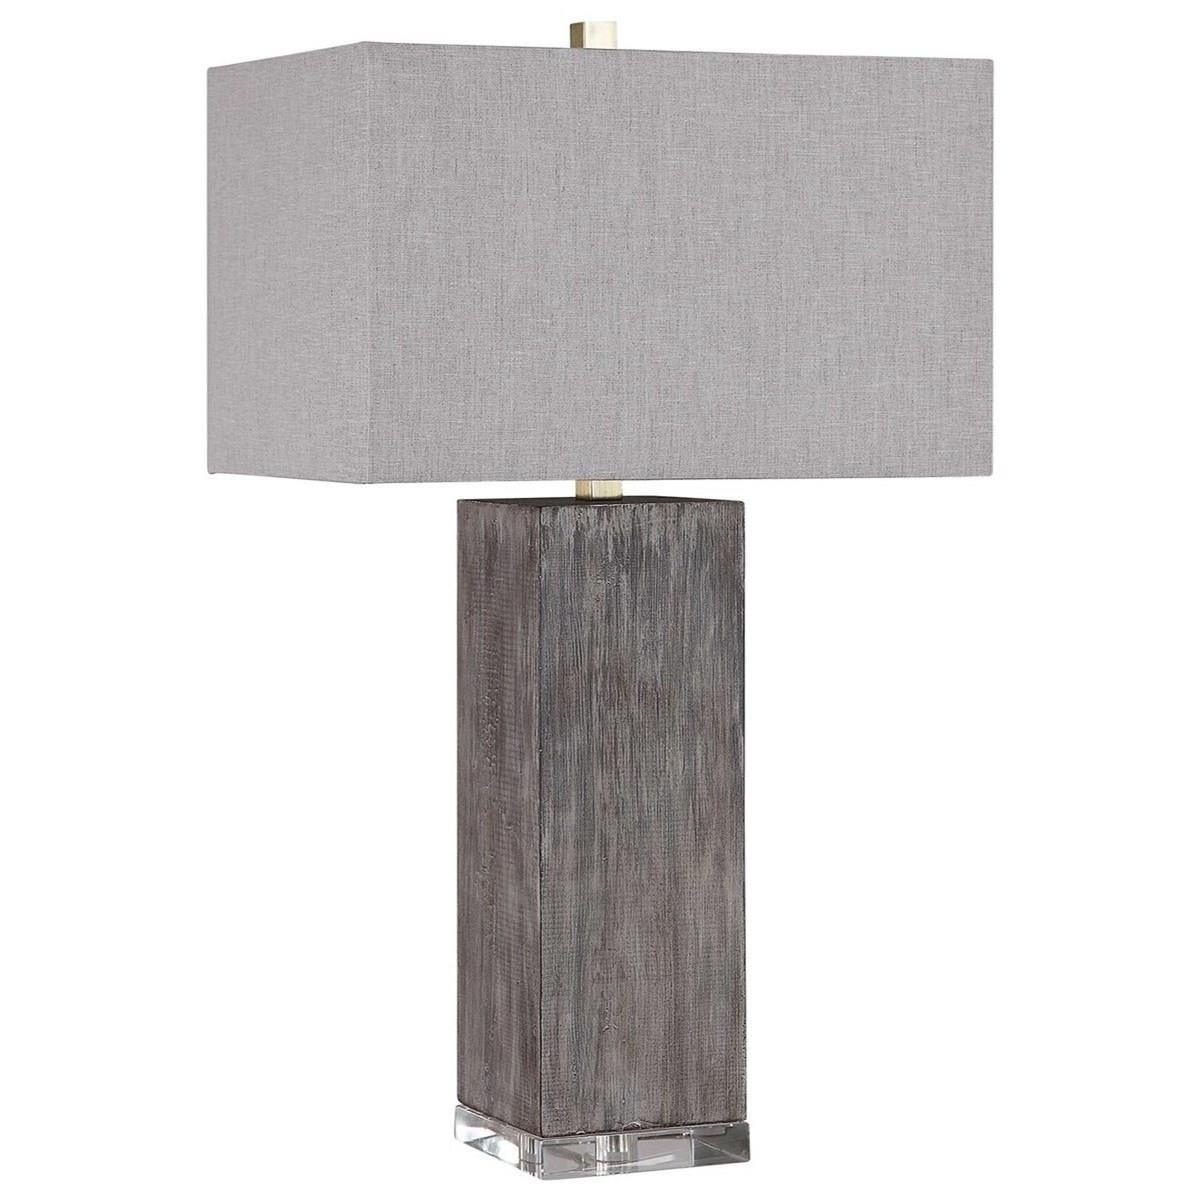 Vilano Modern Table Lamp